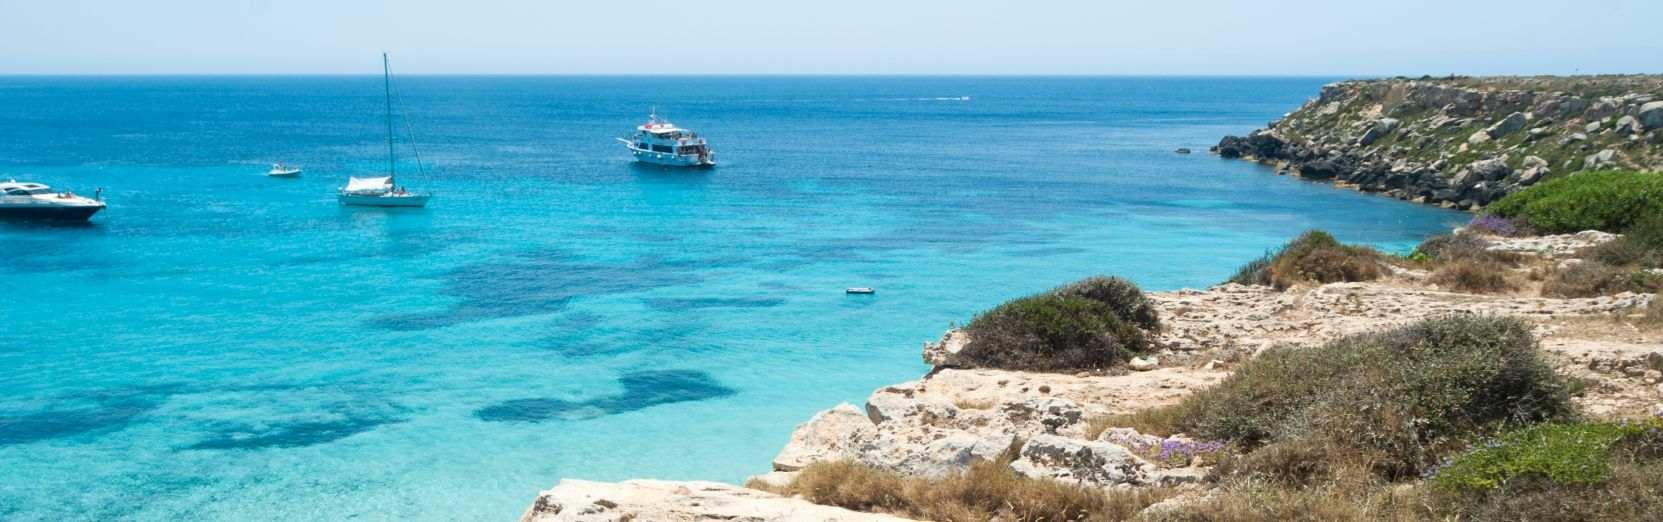 Sizilien Kurzurlaub